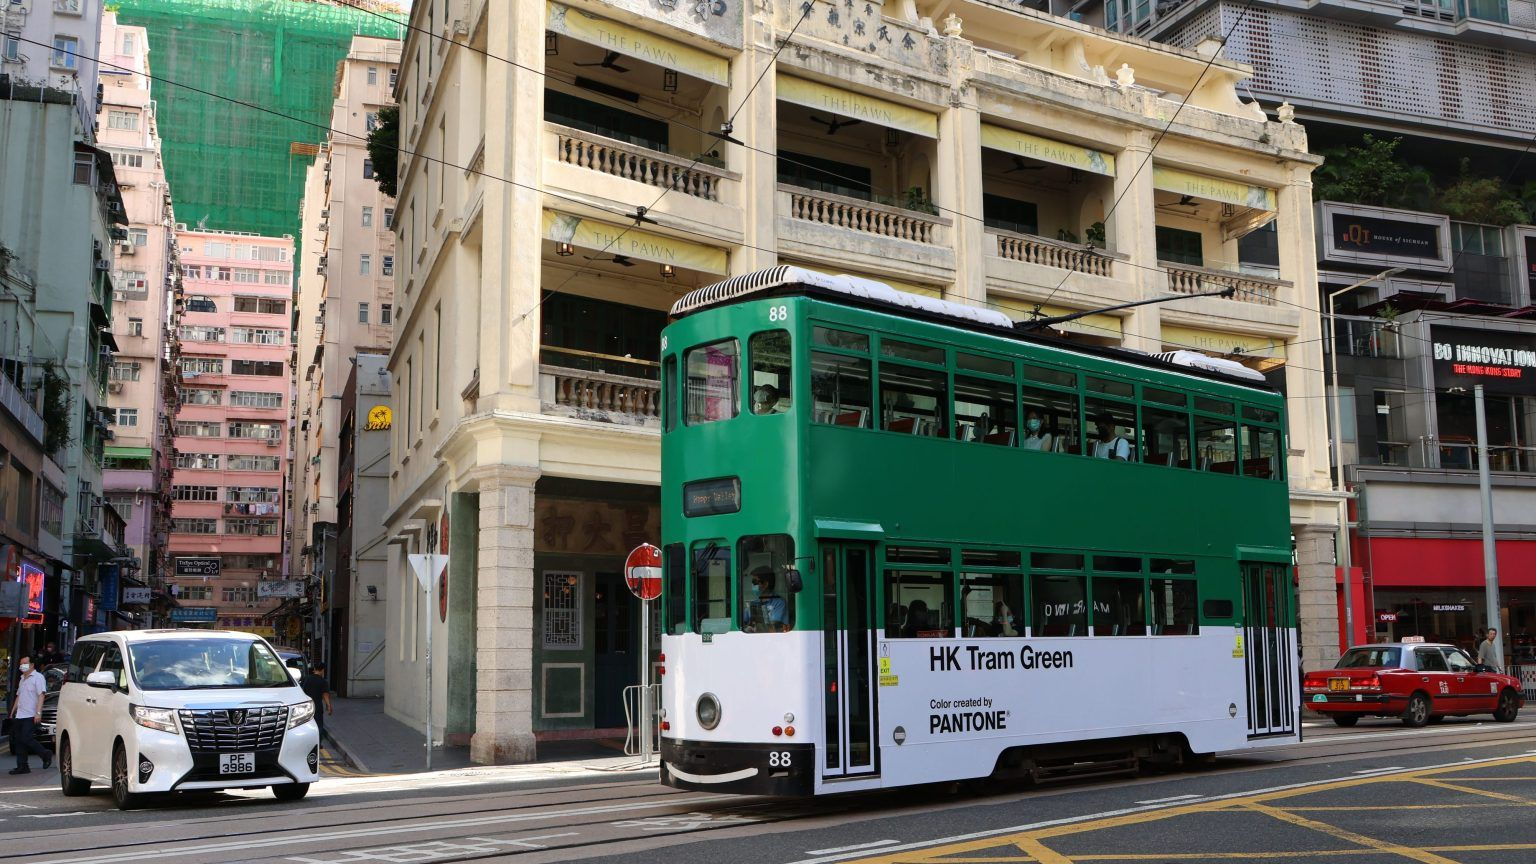 hong kong tramways - green pantone - hk tram green